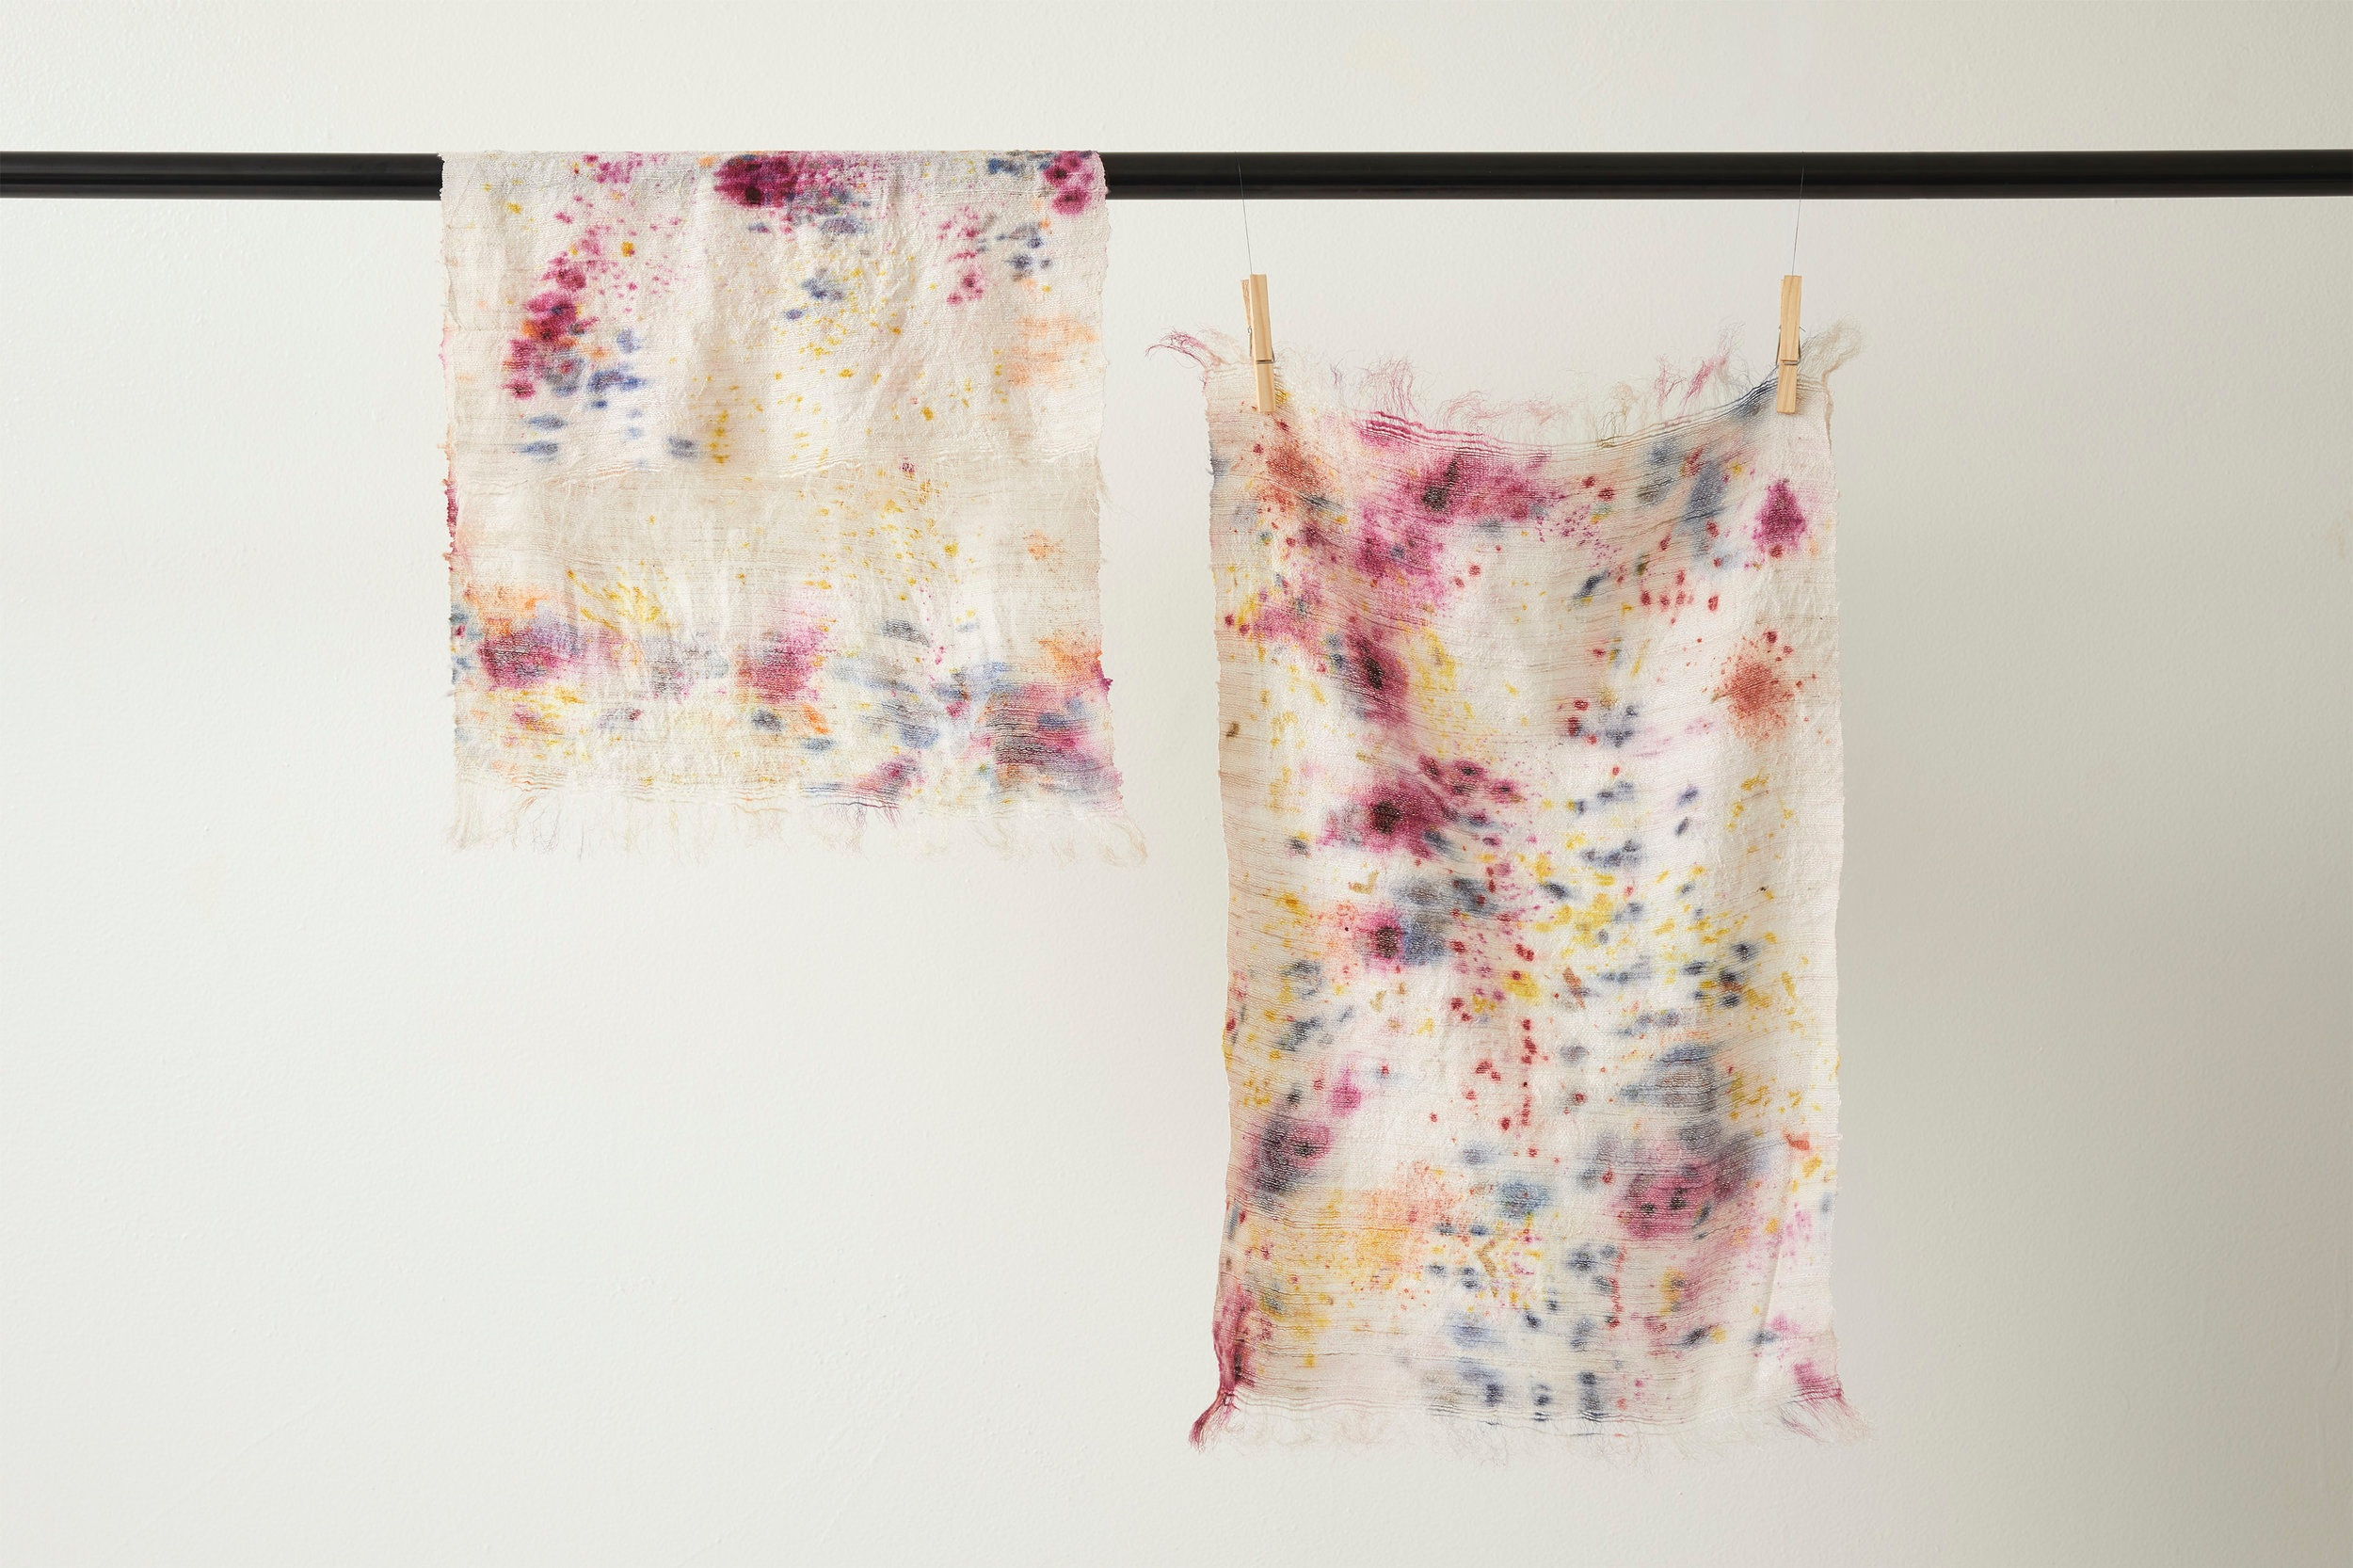 Bundled dye placemats for 5TH26 on Eri Silk